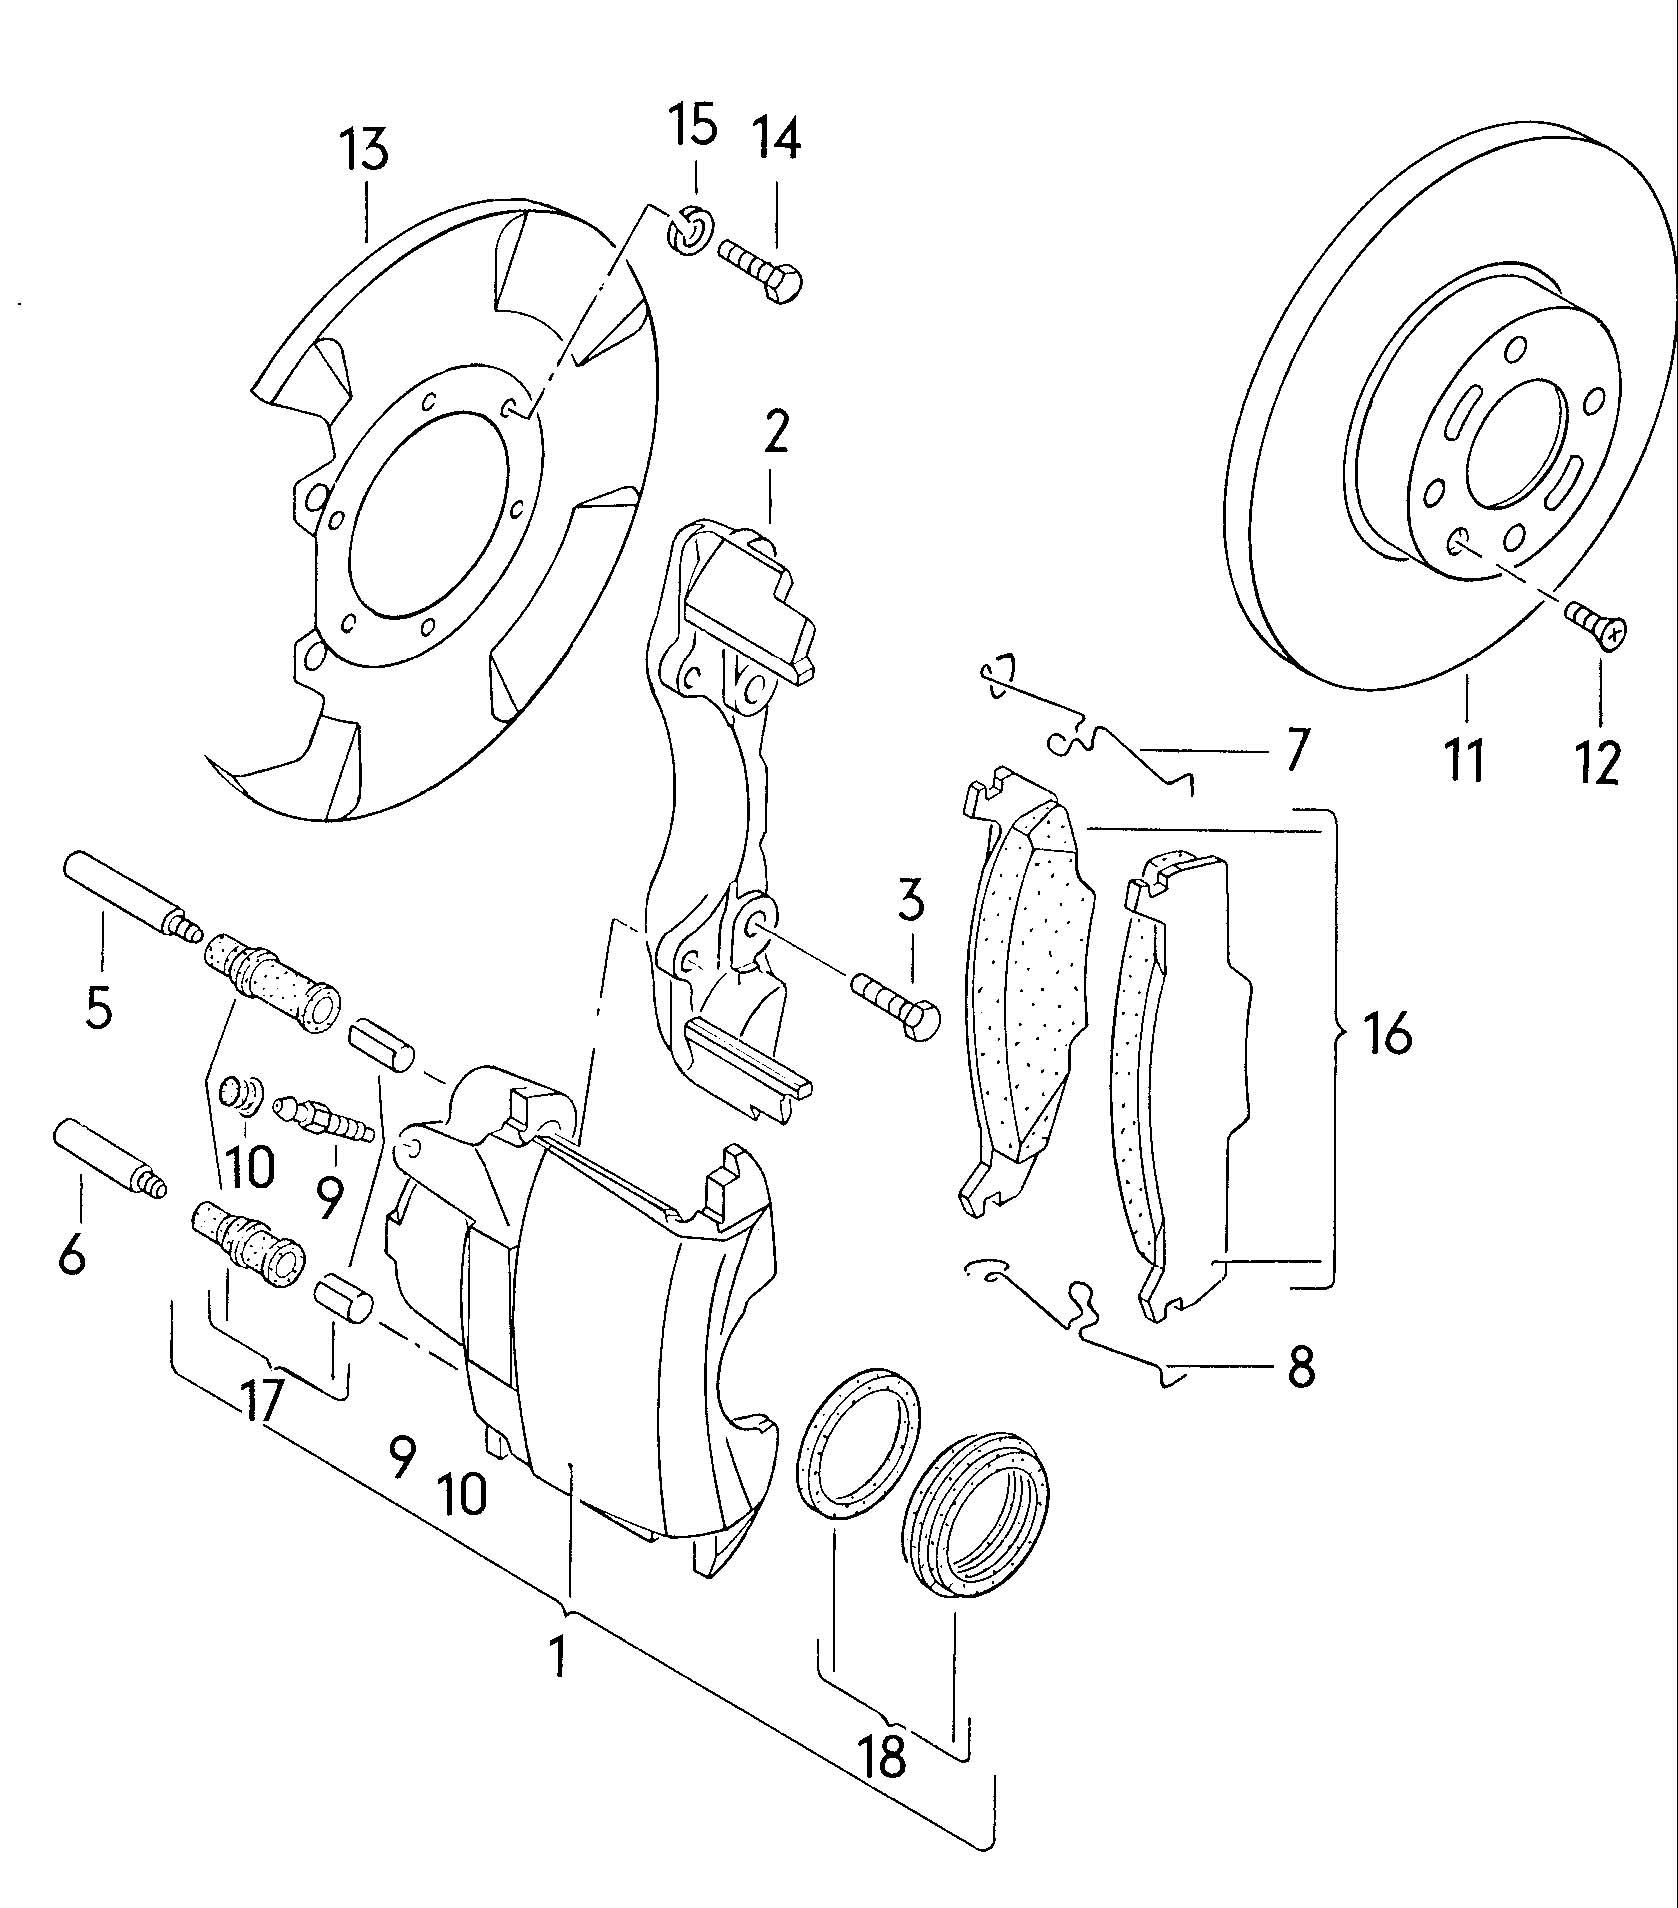 94 vw jetta parts diagram caravan water pressure switch wiring volkswagen custom imageresizertool com